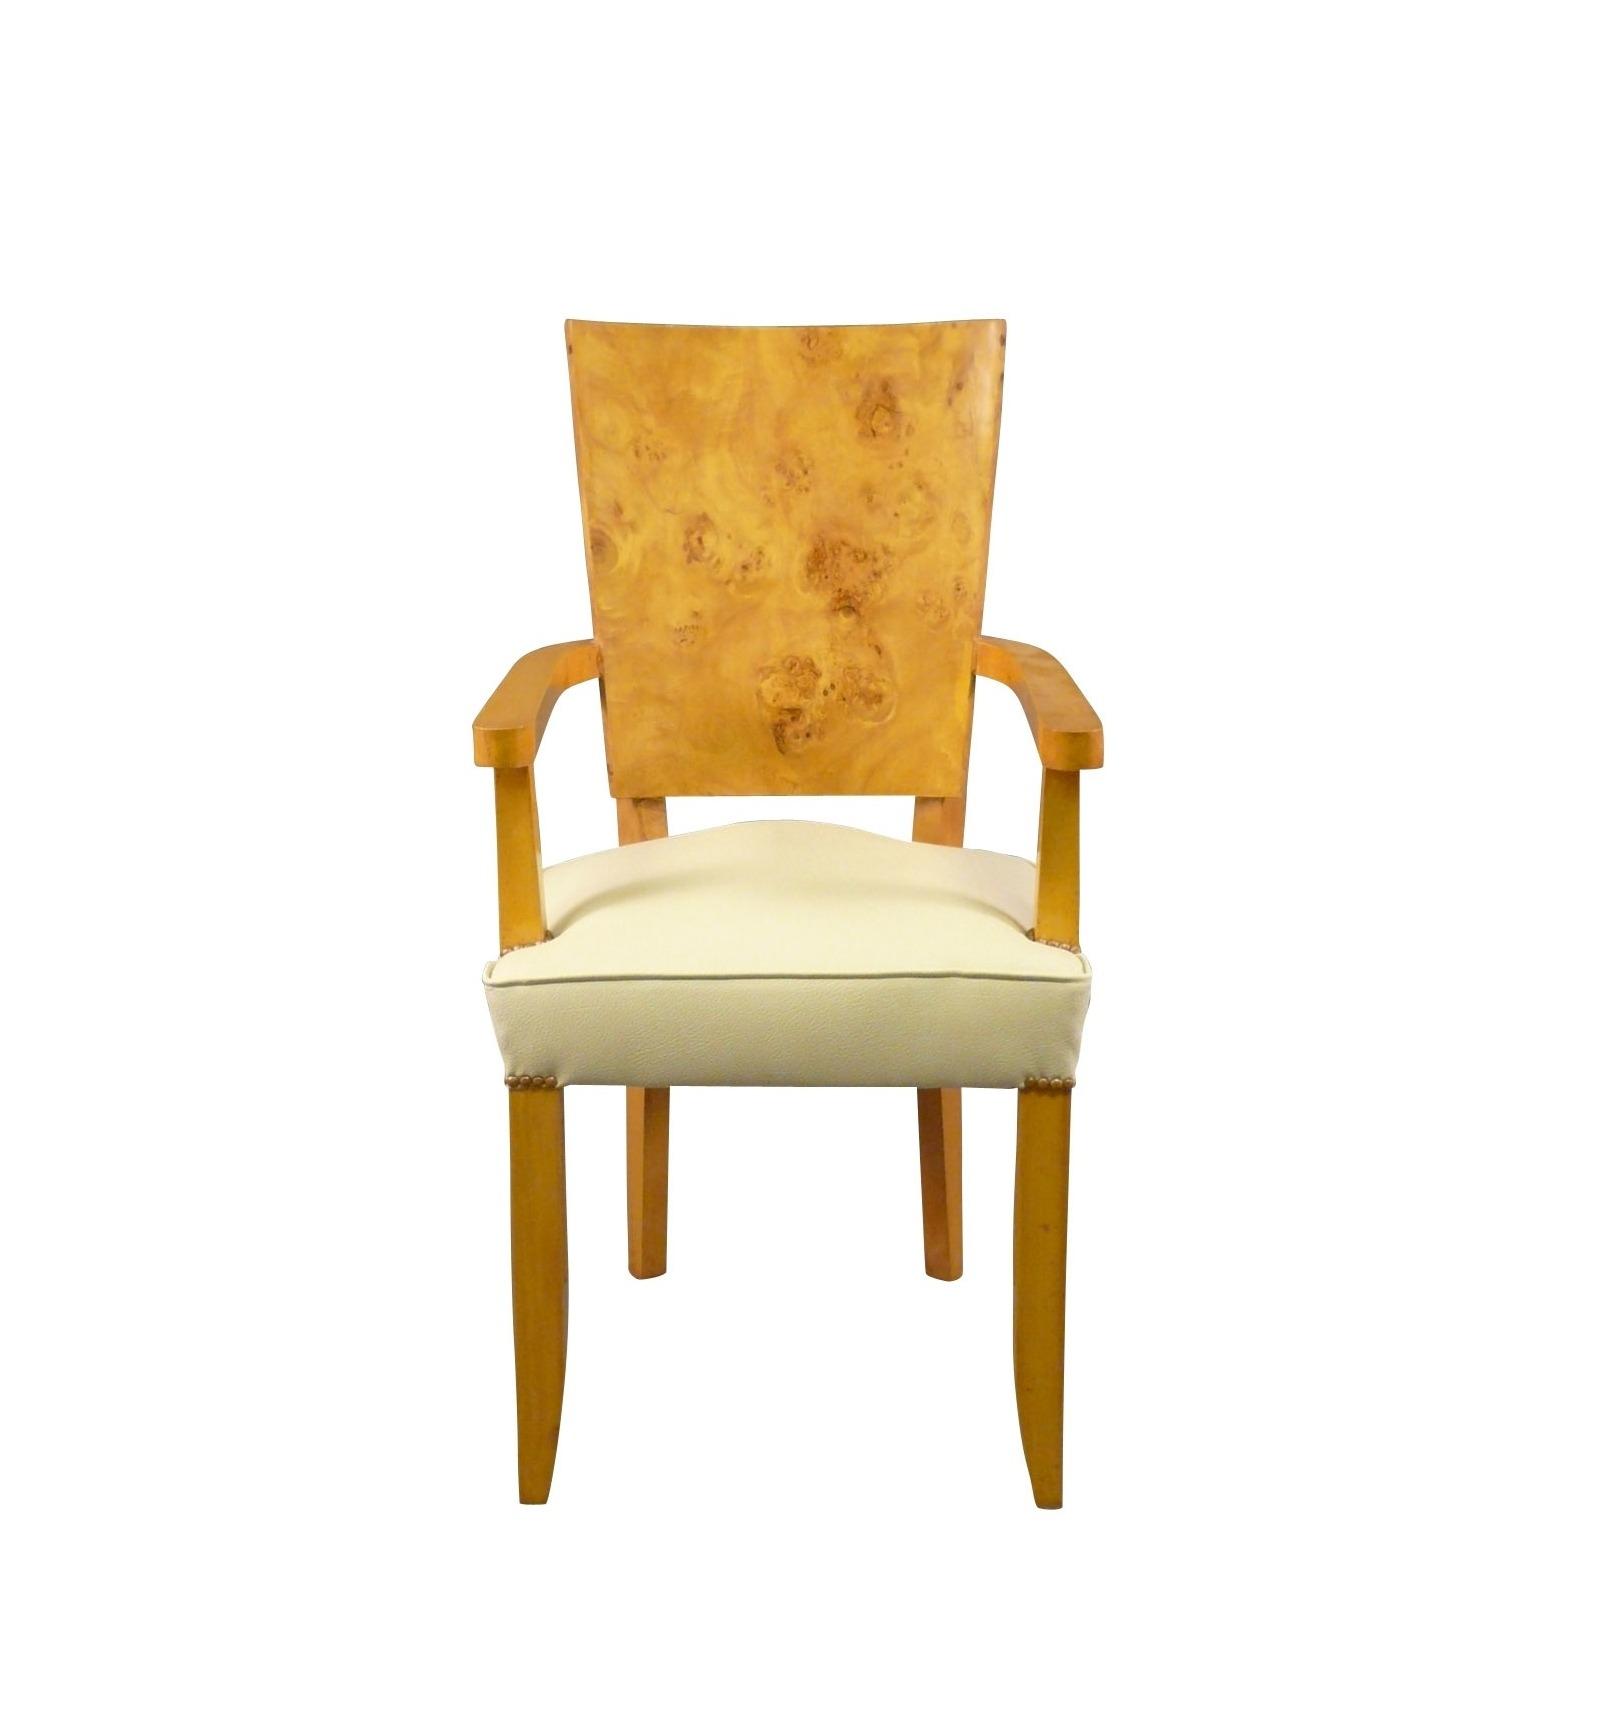 sessel art deco in der bildschirmlupe elm art 1920. Black Bedroom Furniture Sets. Home Design Ideas